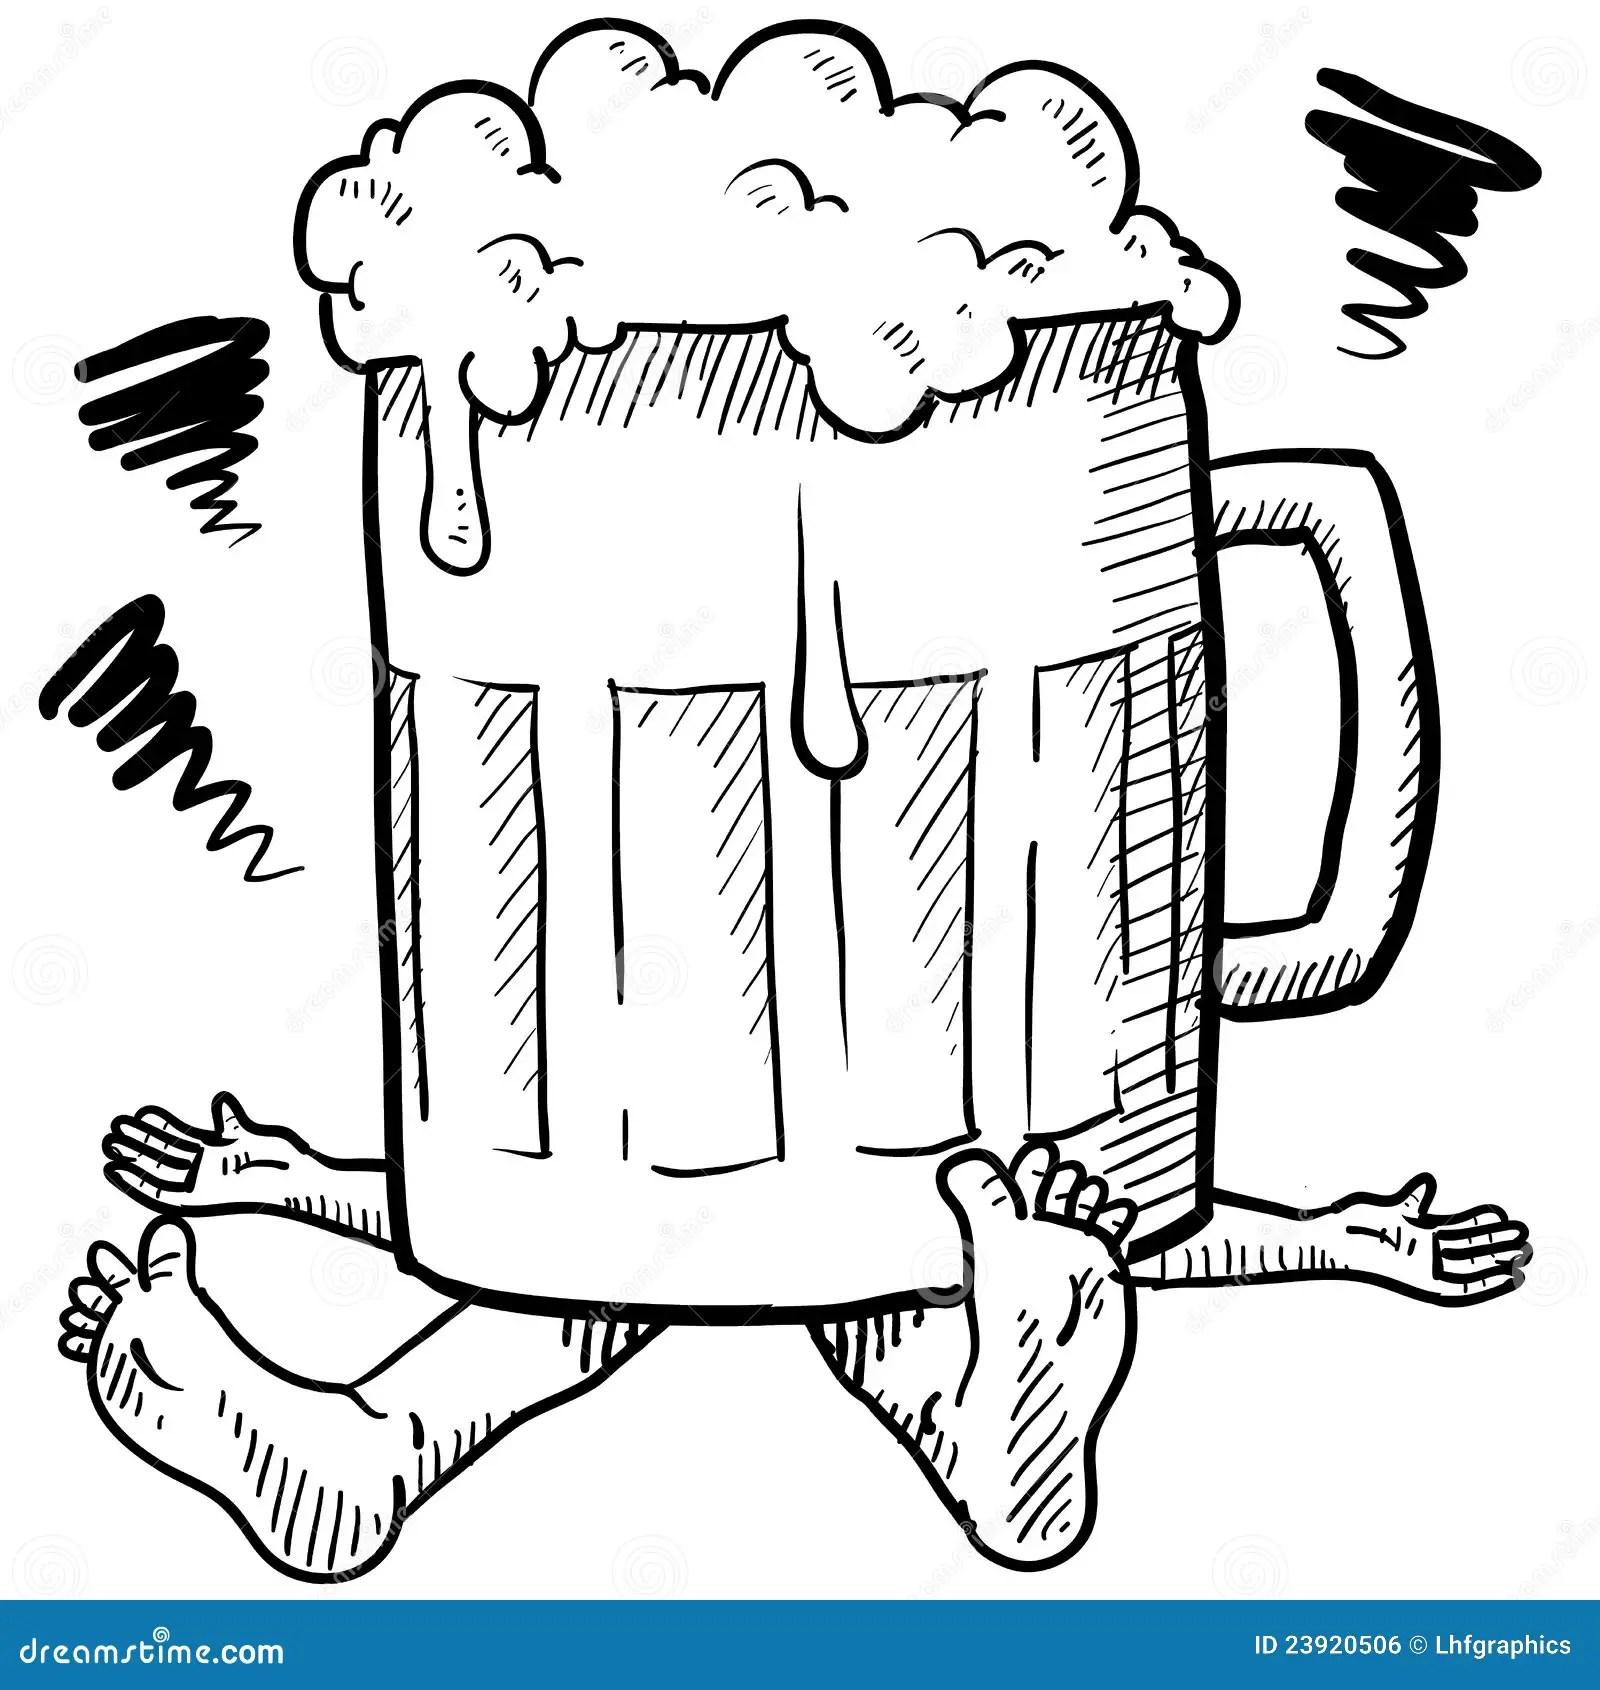 Alcoholism Metaphor Sketch Royalty Free Stock Image